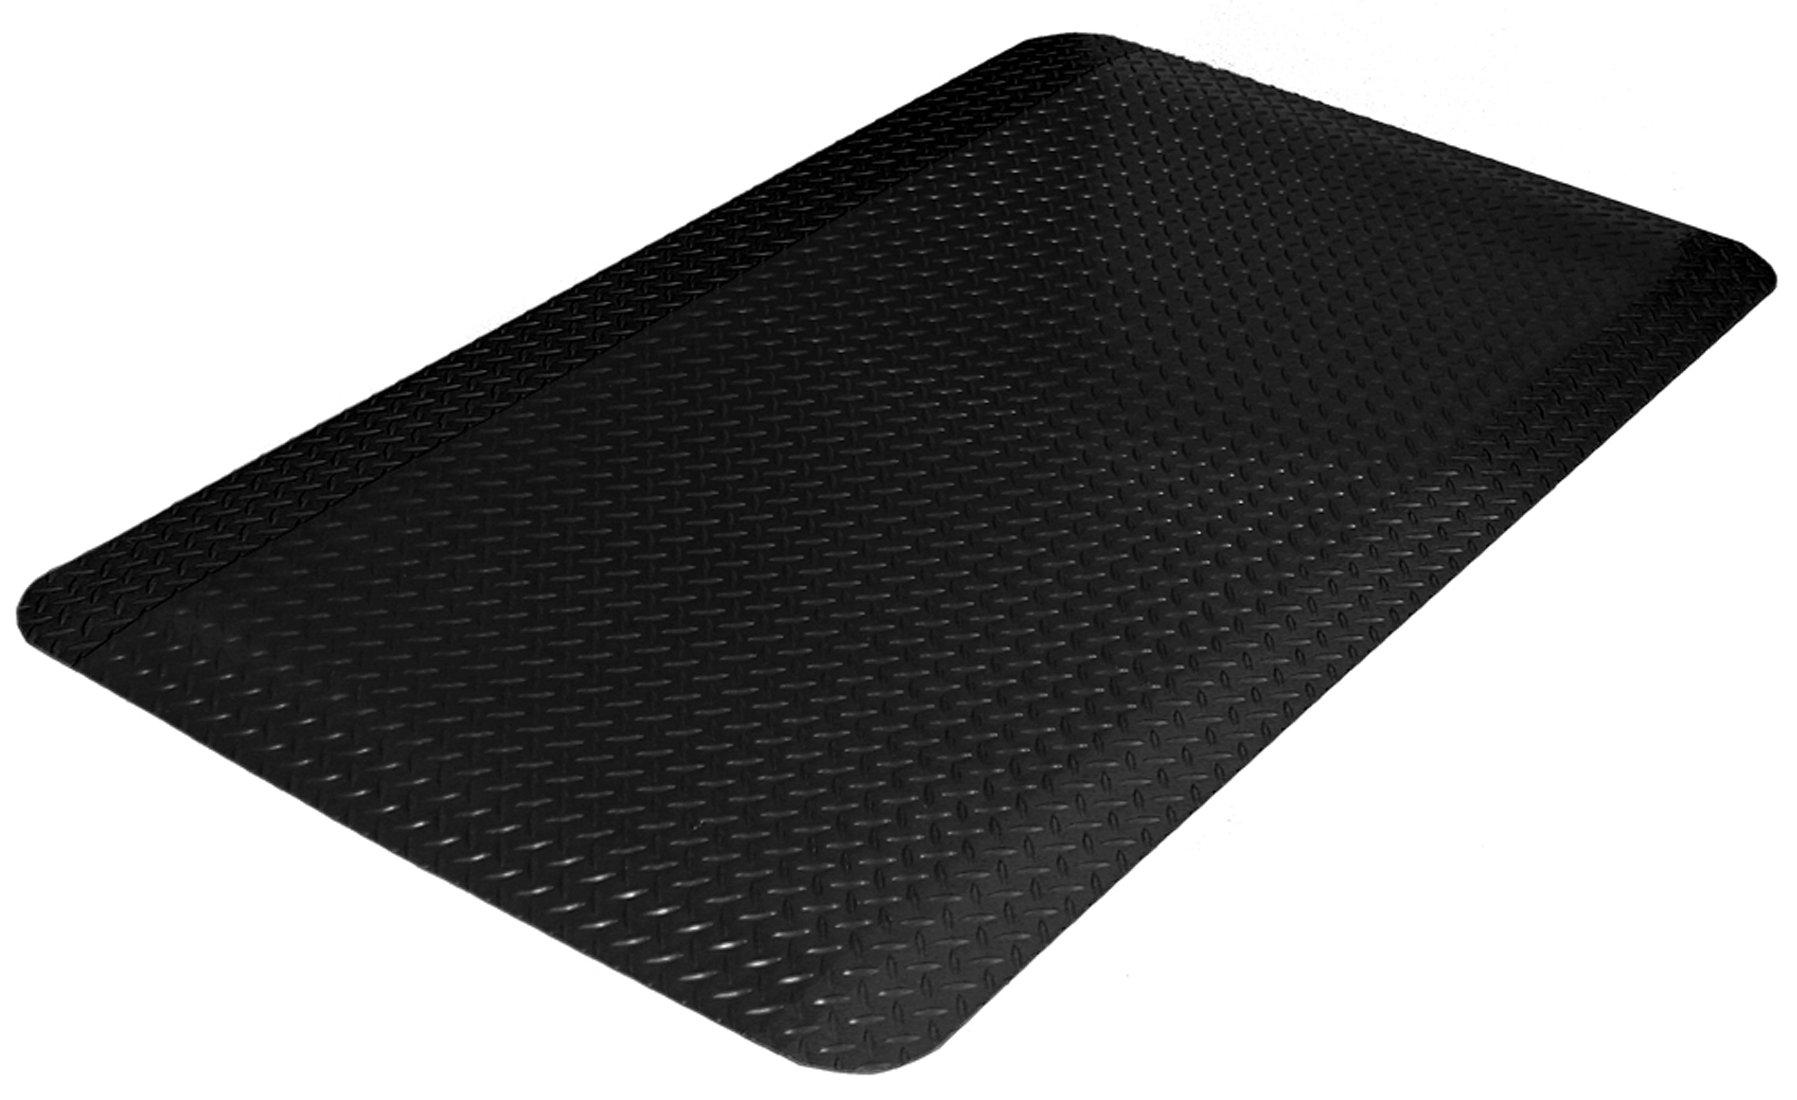 Durable Vinyl Diamond-Dek Sponge Industrial Anti-Fatigue Floor Mat, 3' x 5', Black